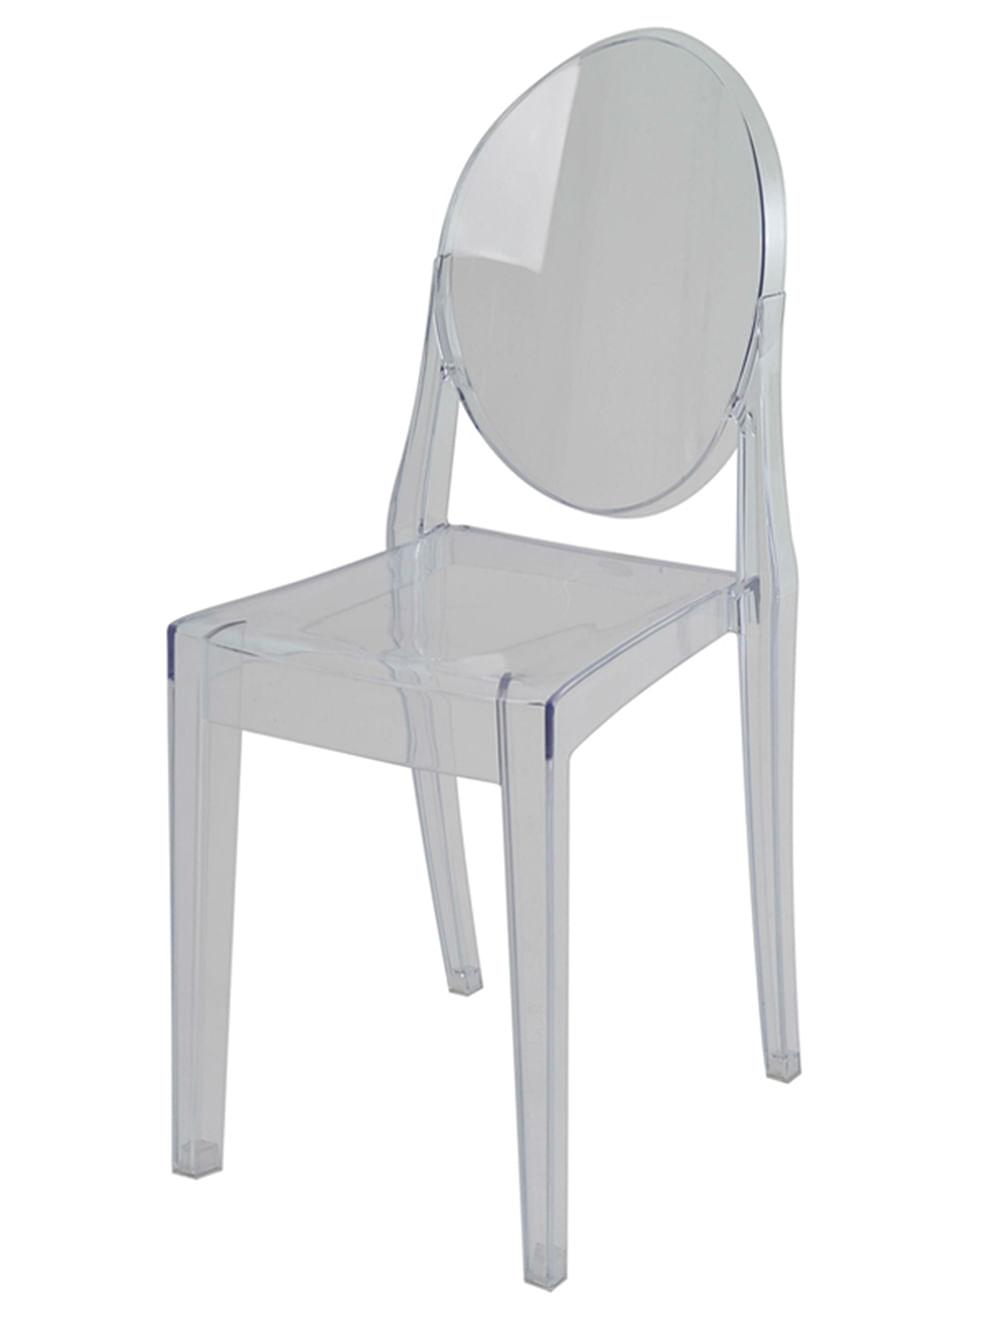 Cadeira Louis Ghost Sem Braco PC Incolor - 44153